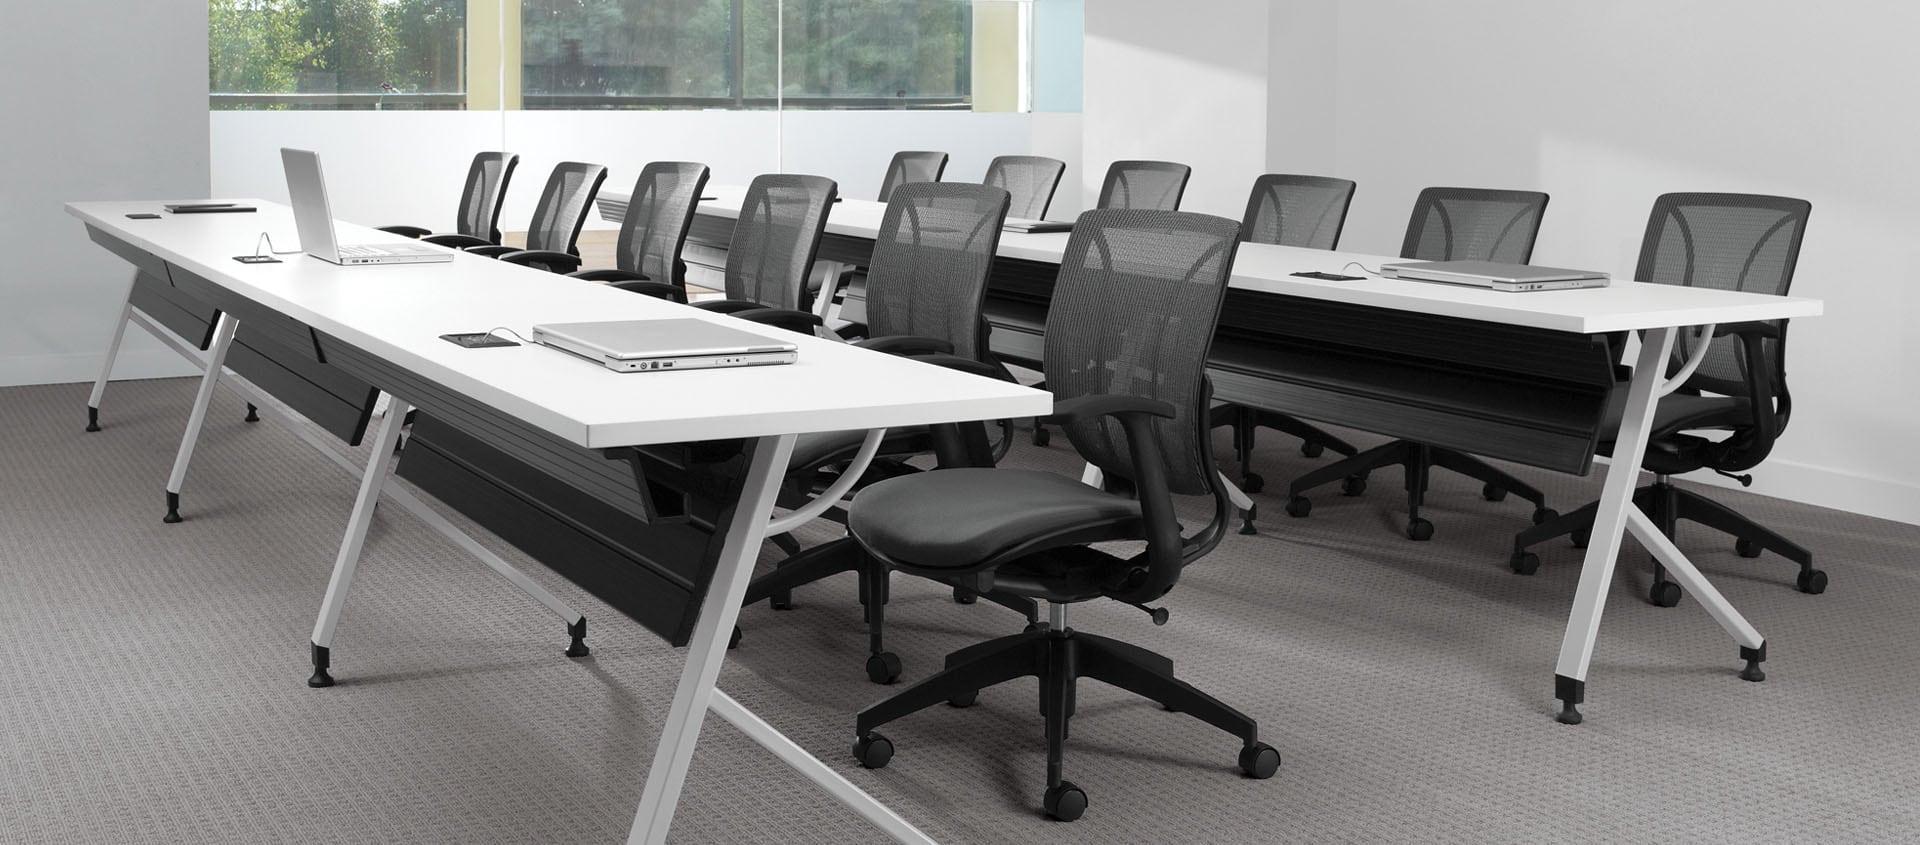 Sidebar Collaborative Desk System